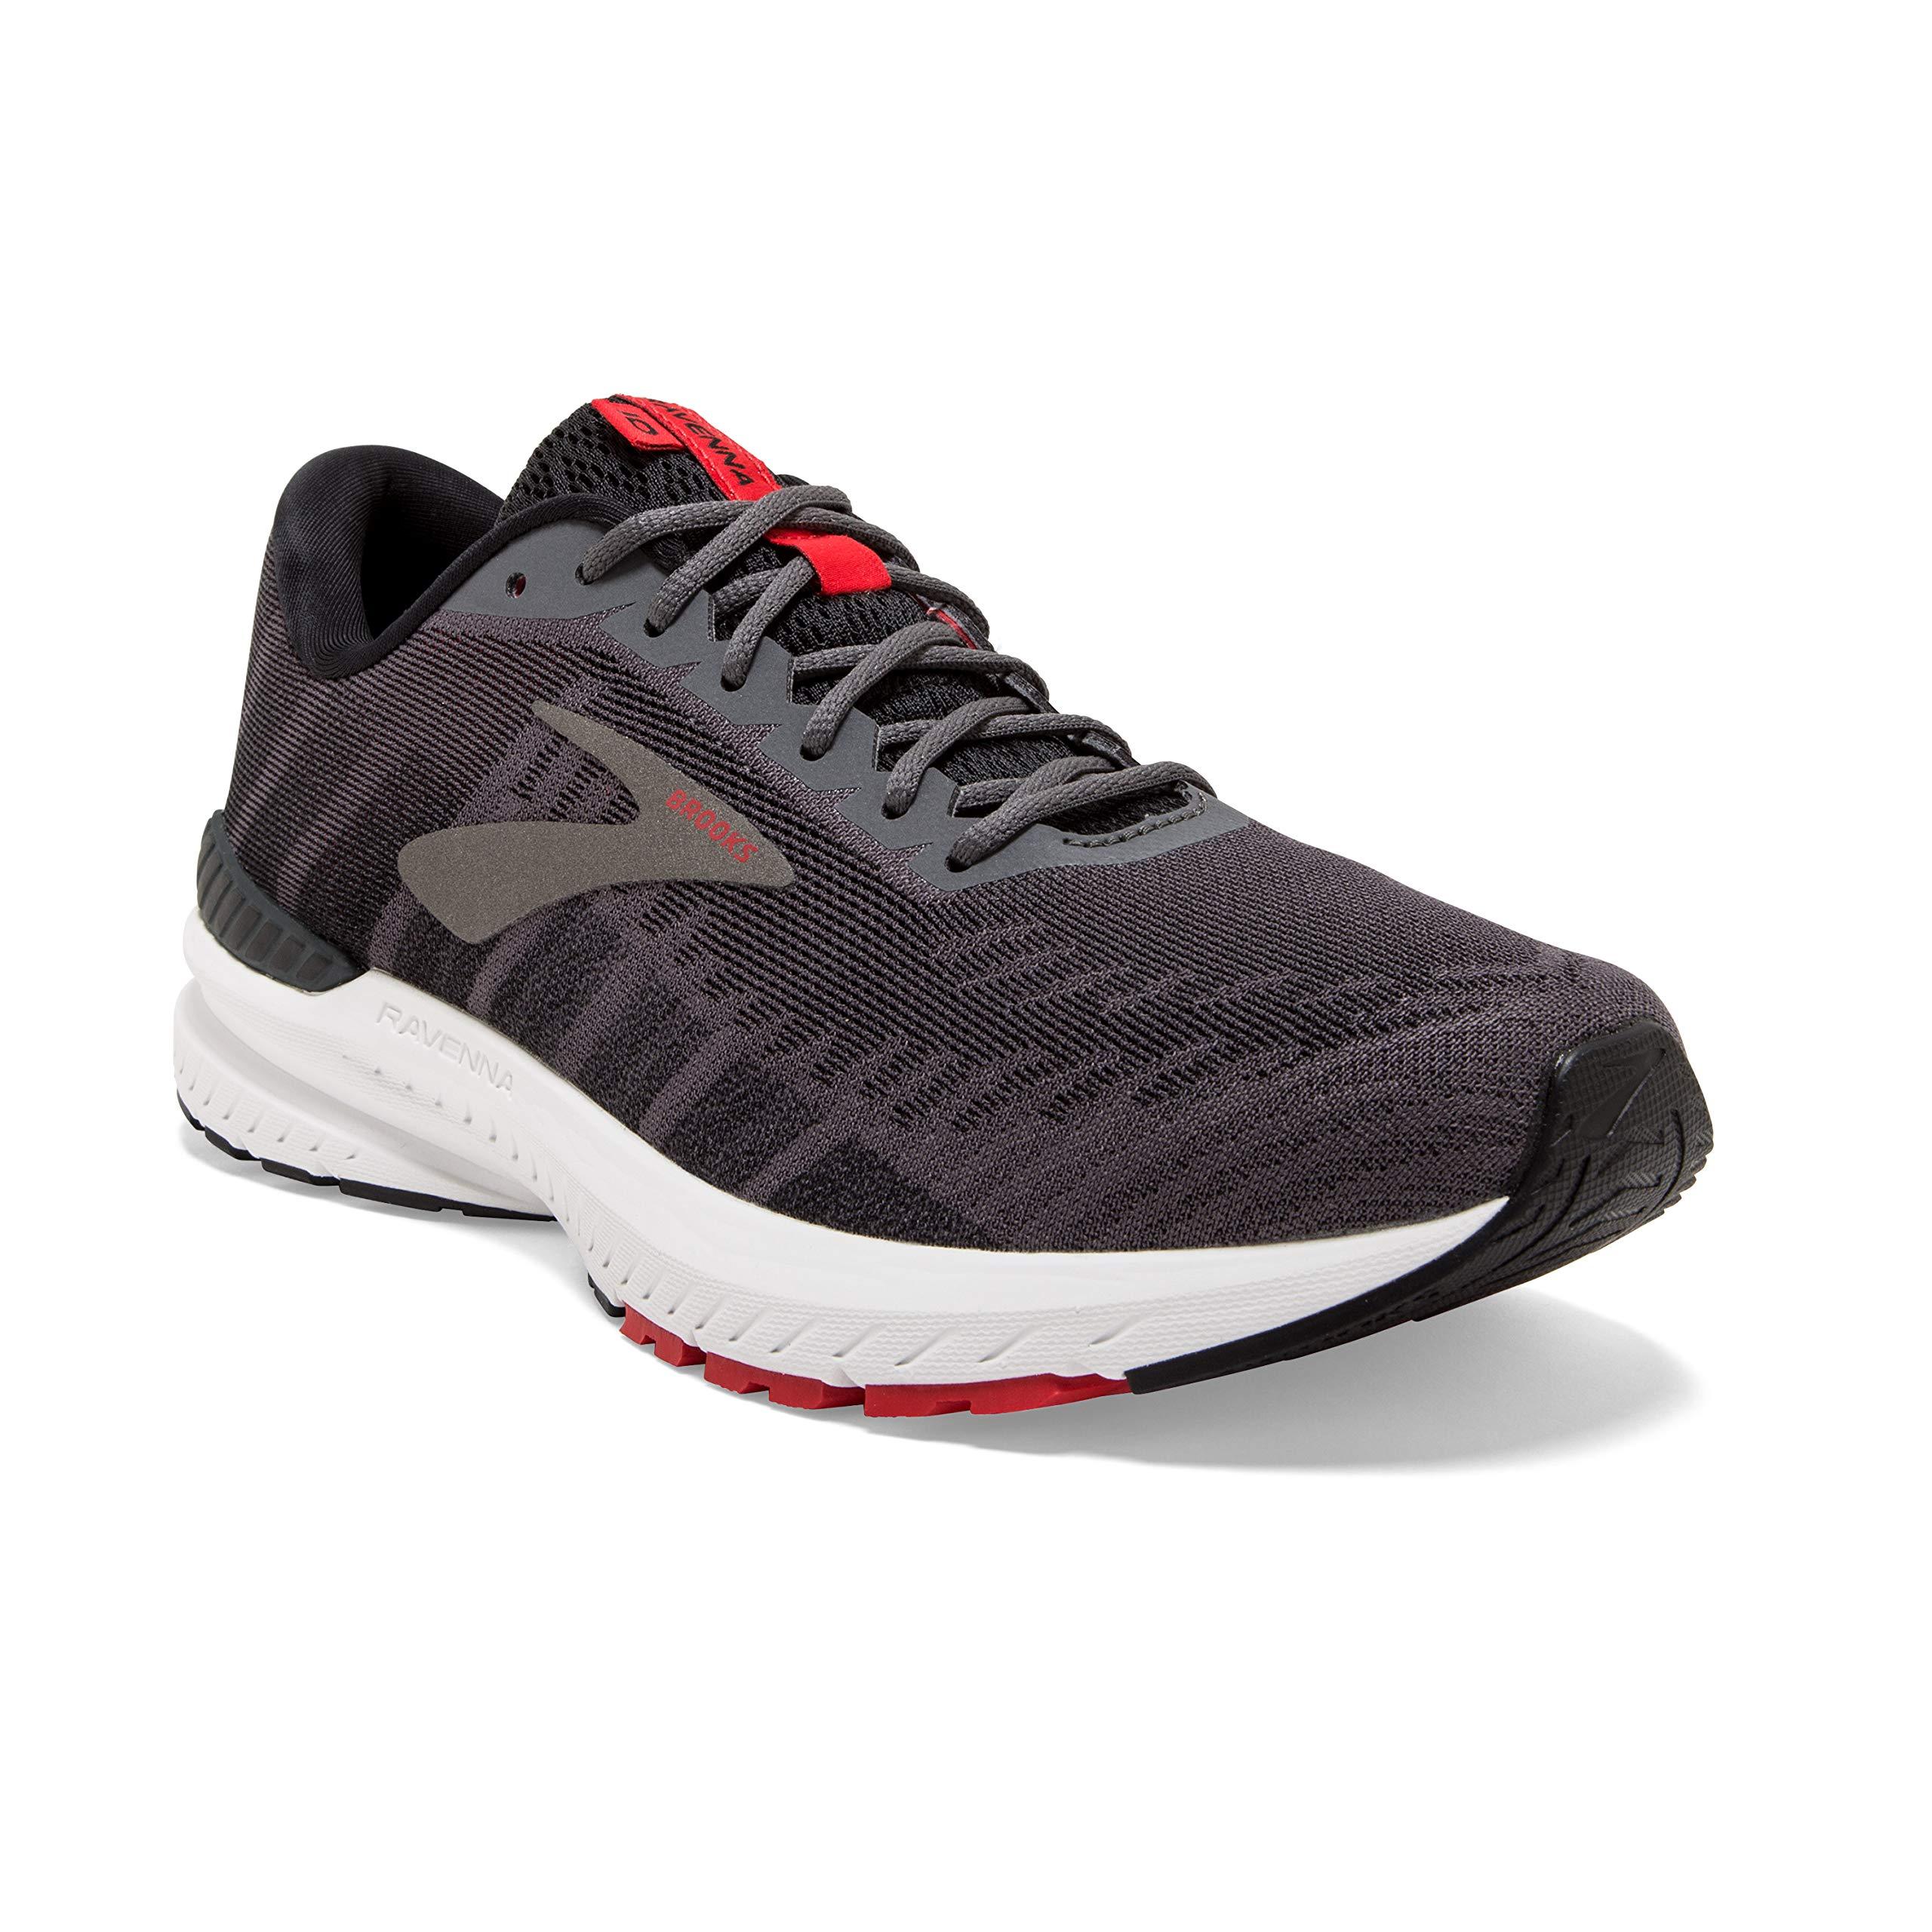 Brooks Mens Ravenna 10 Running Shoe - Ebony/Black/Red - D - 11.0 by Brooks